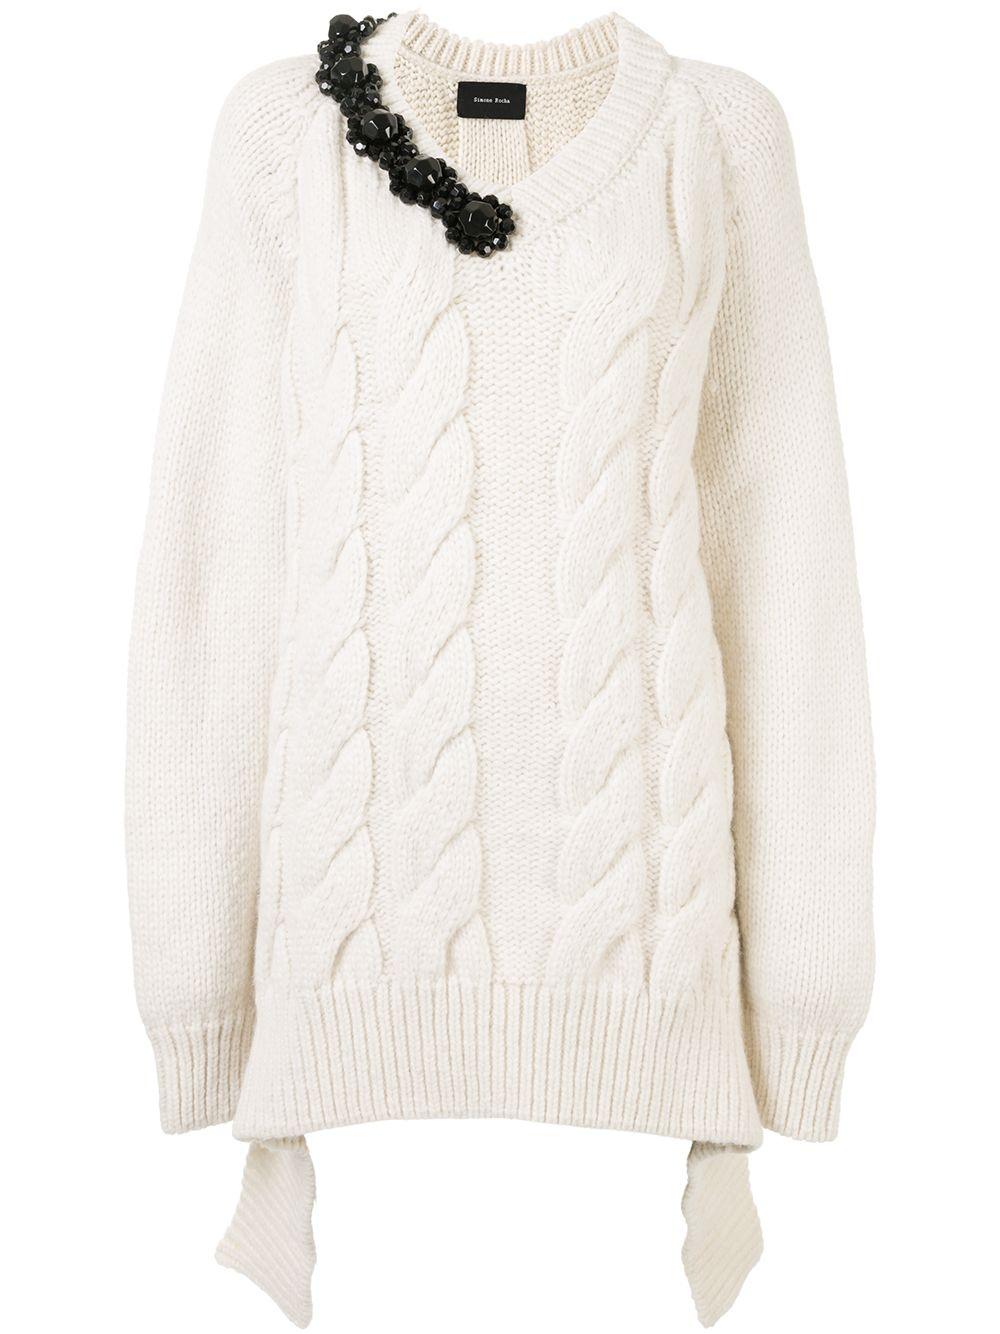 Simone Rocha Verzierter Pullover - Weiß